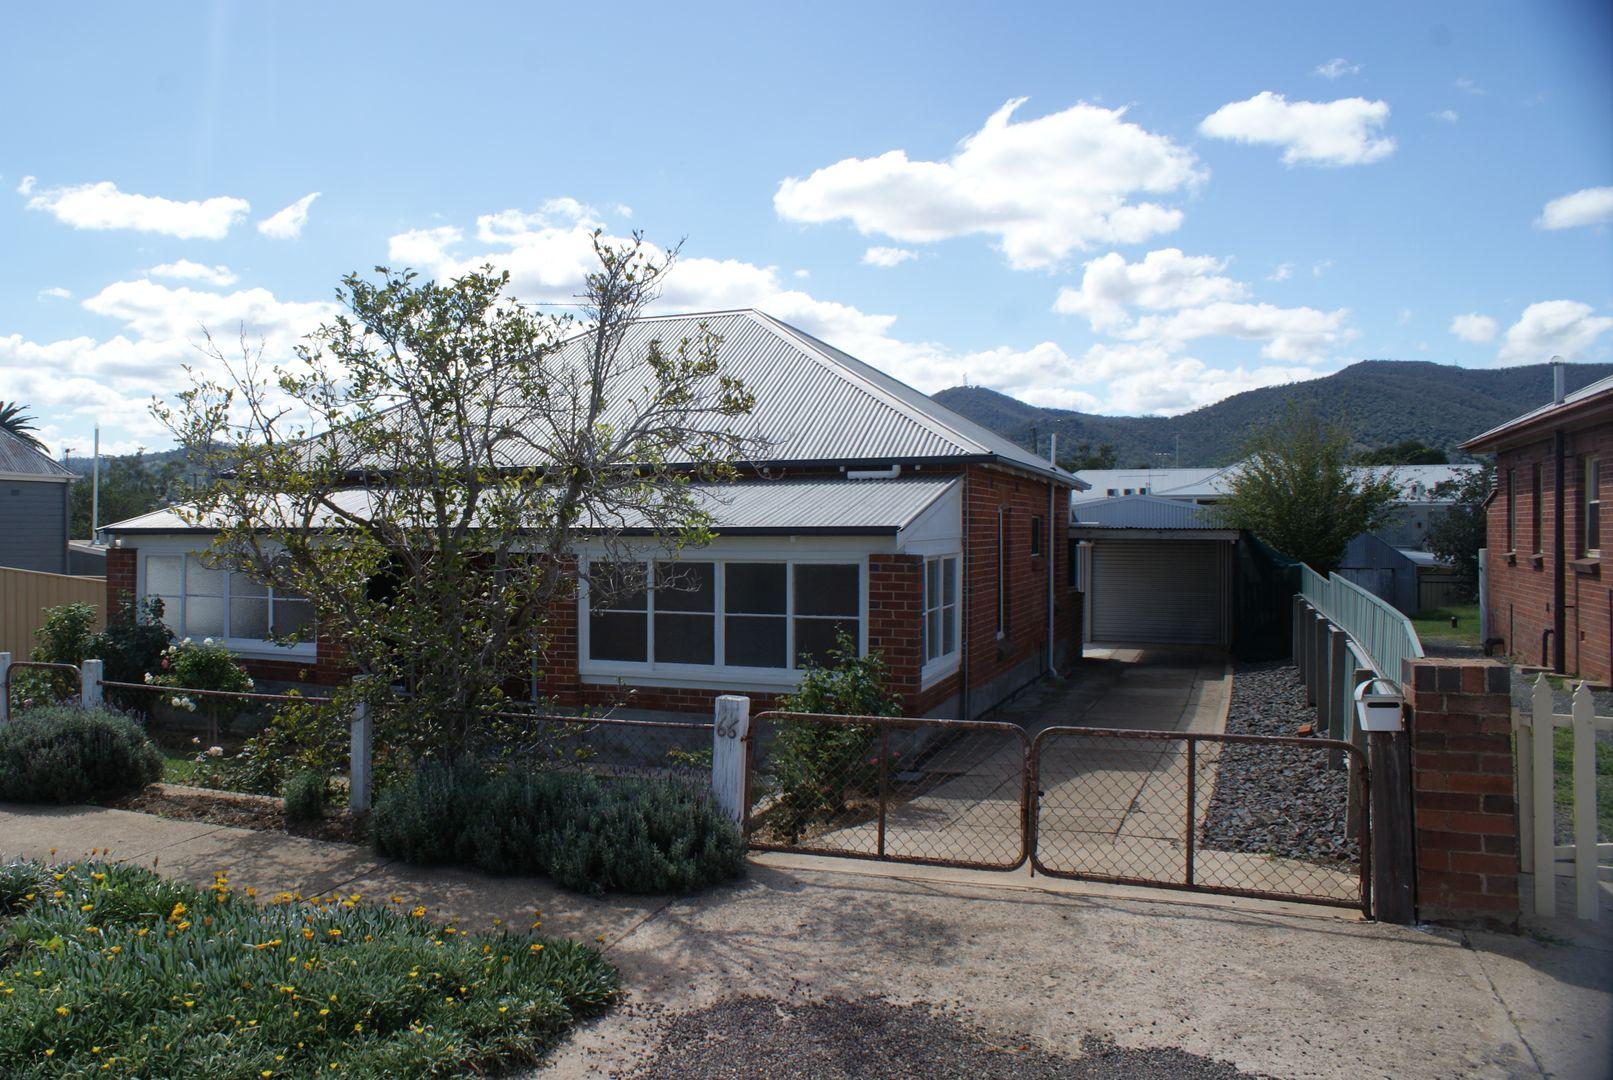 66 Church St, West Tamworth NSW 2340, Image 0